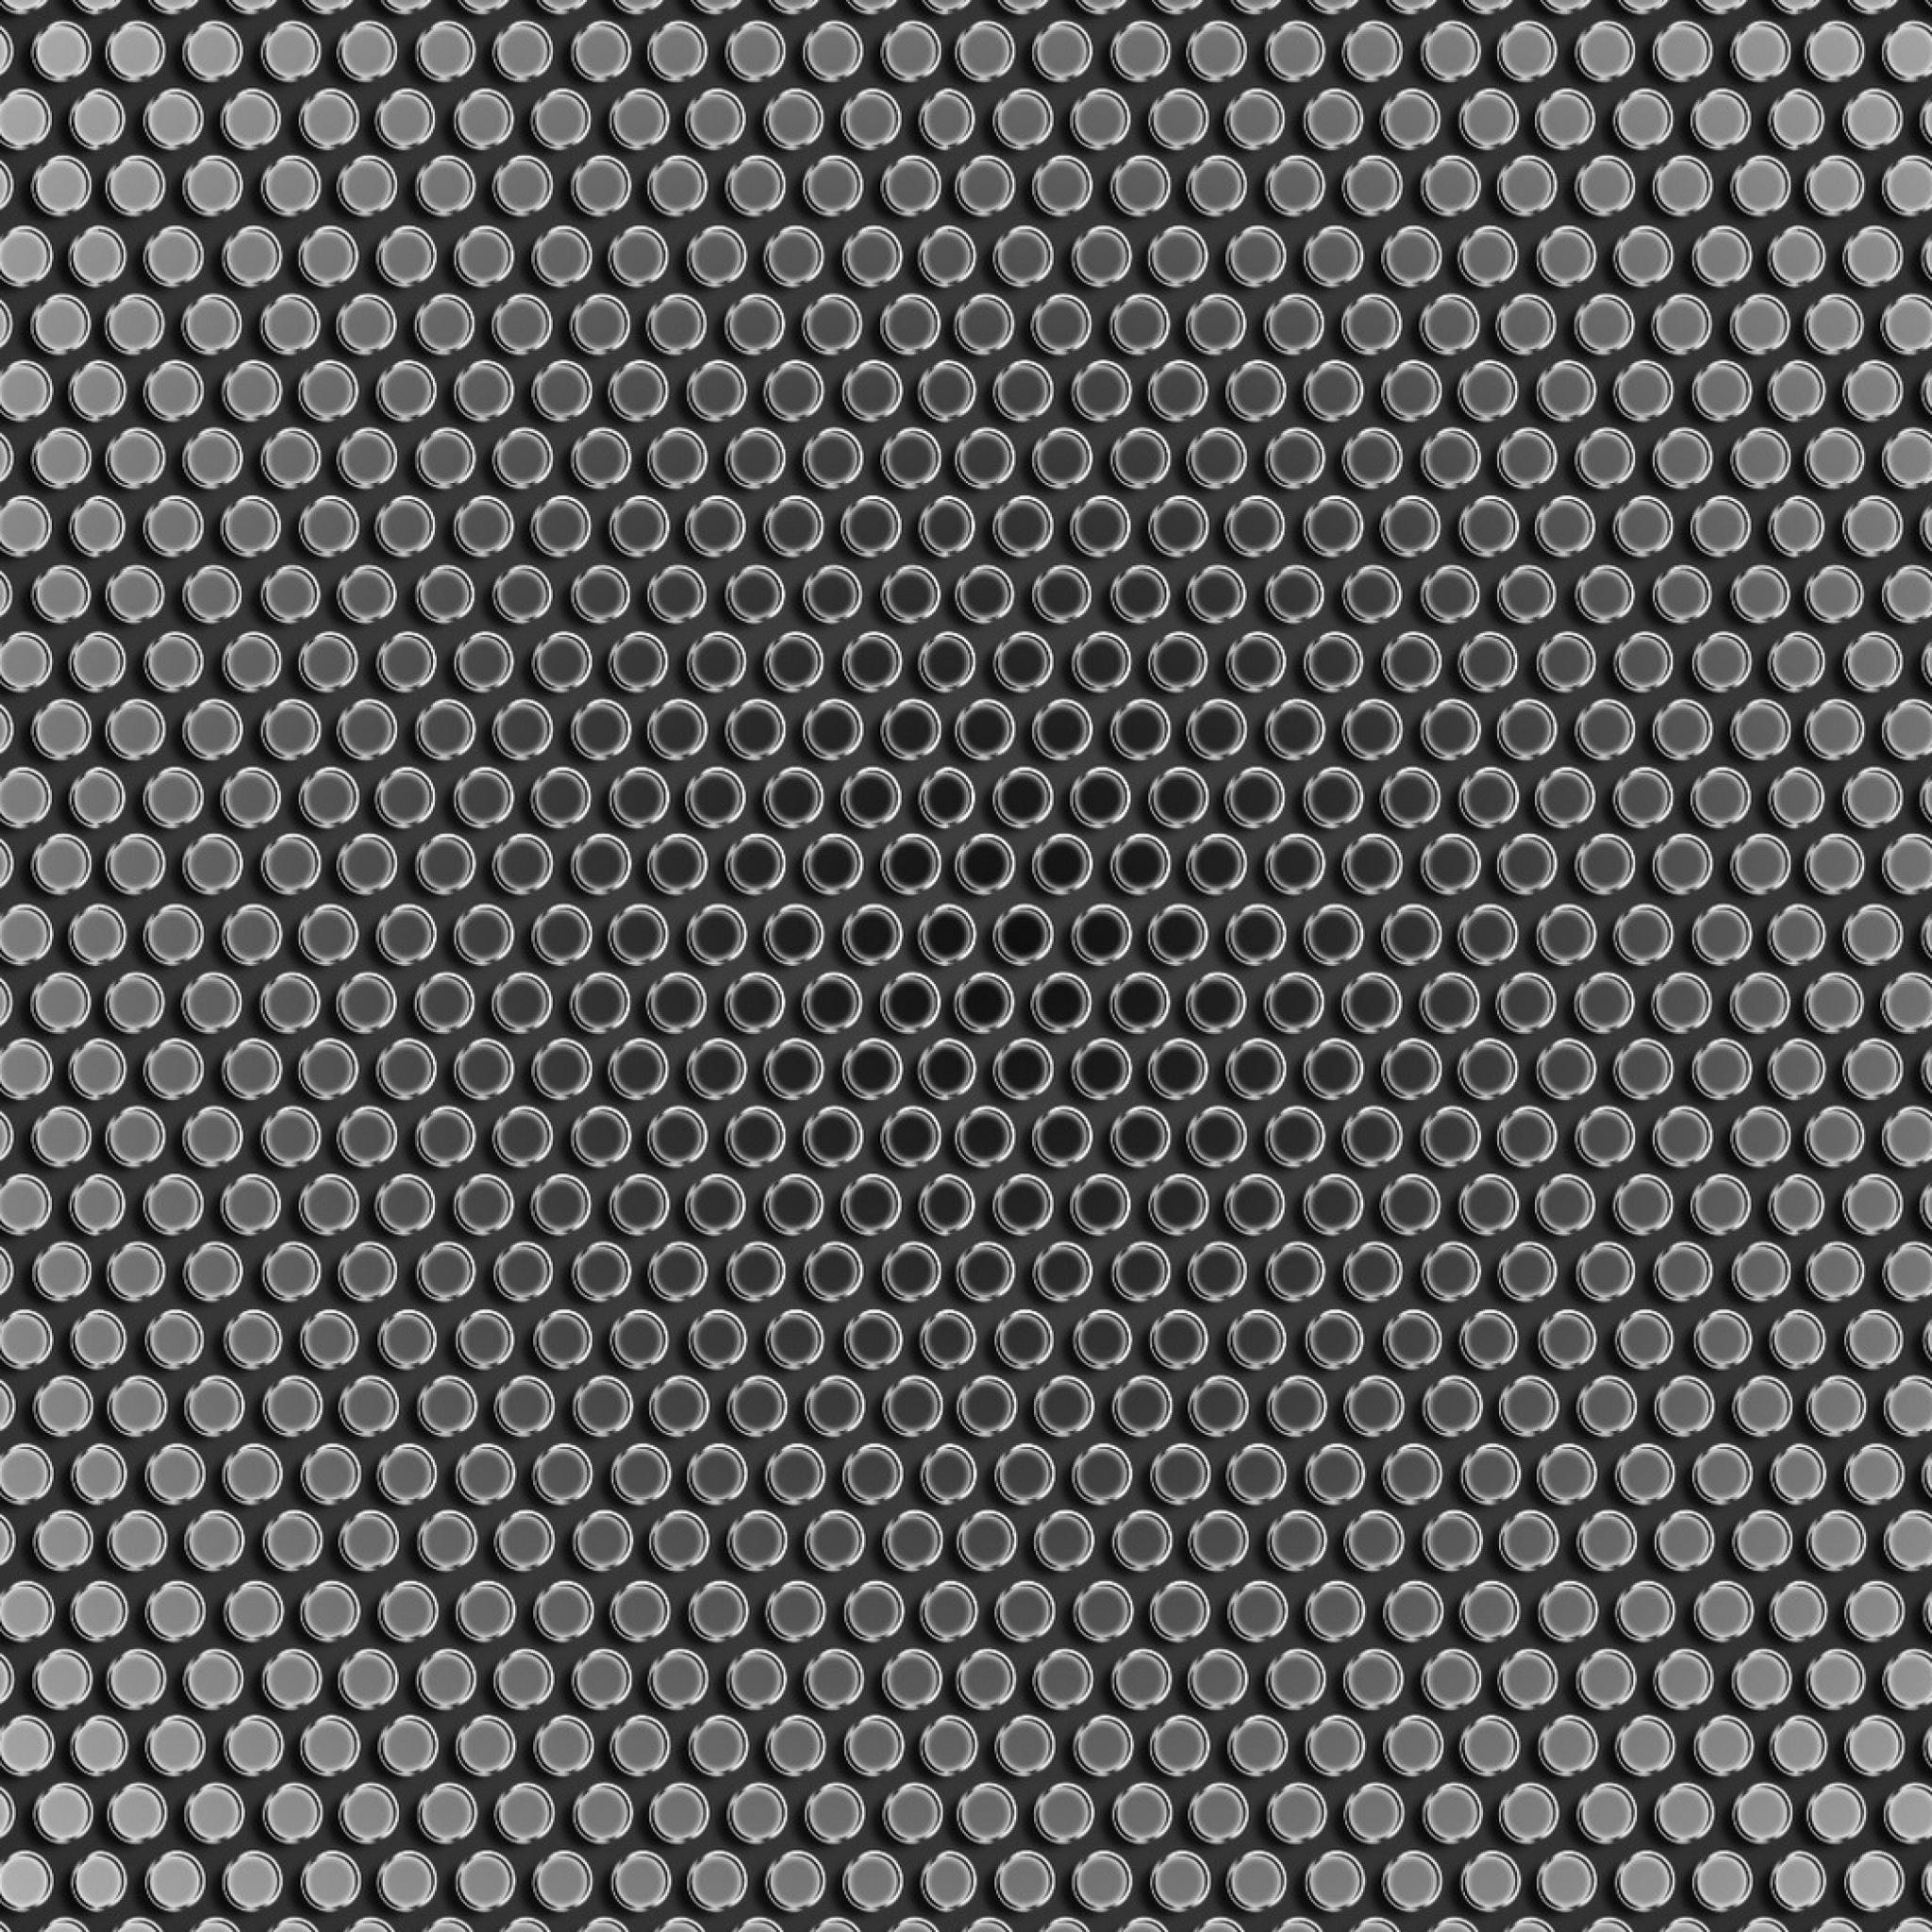 2048x2048 Wallpaper mesh light background metal texture 2048x2048